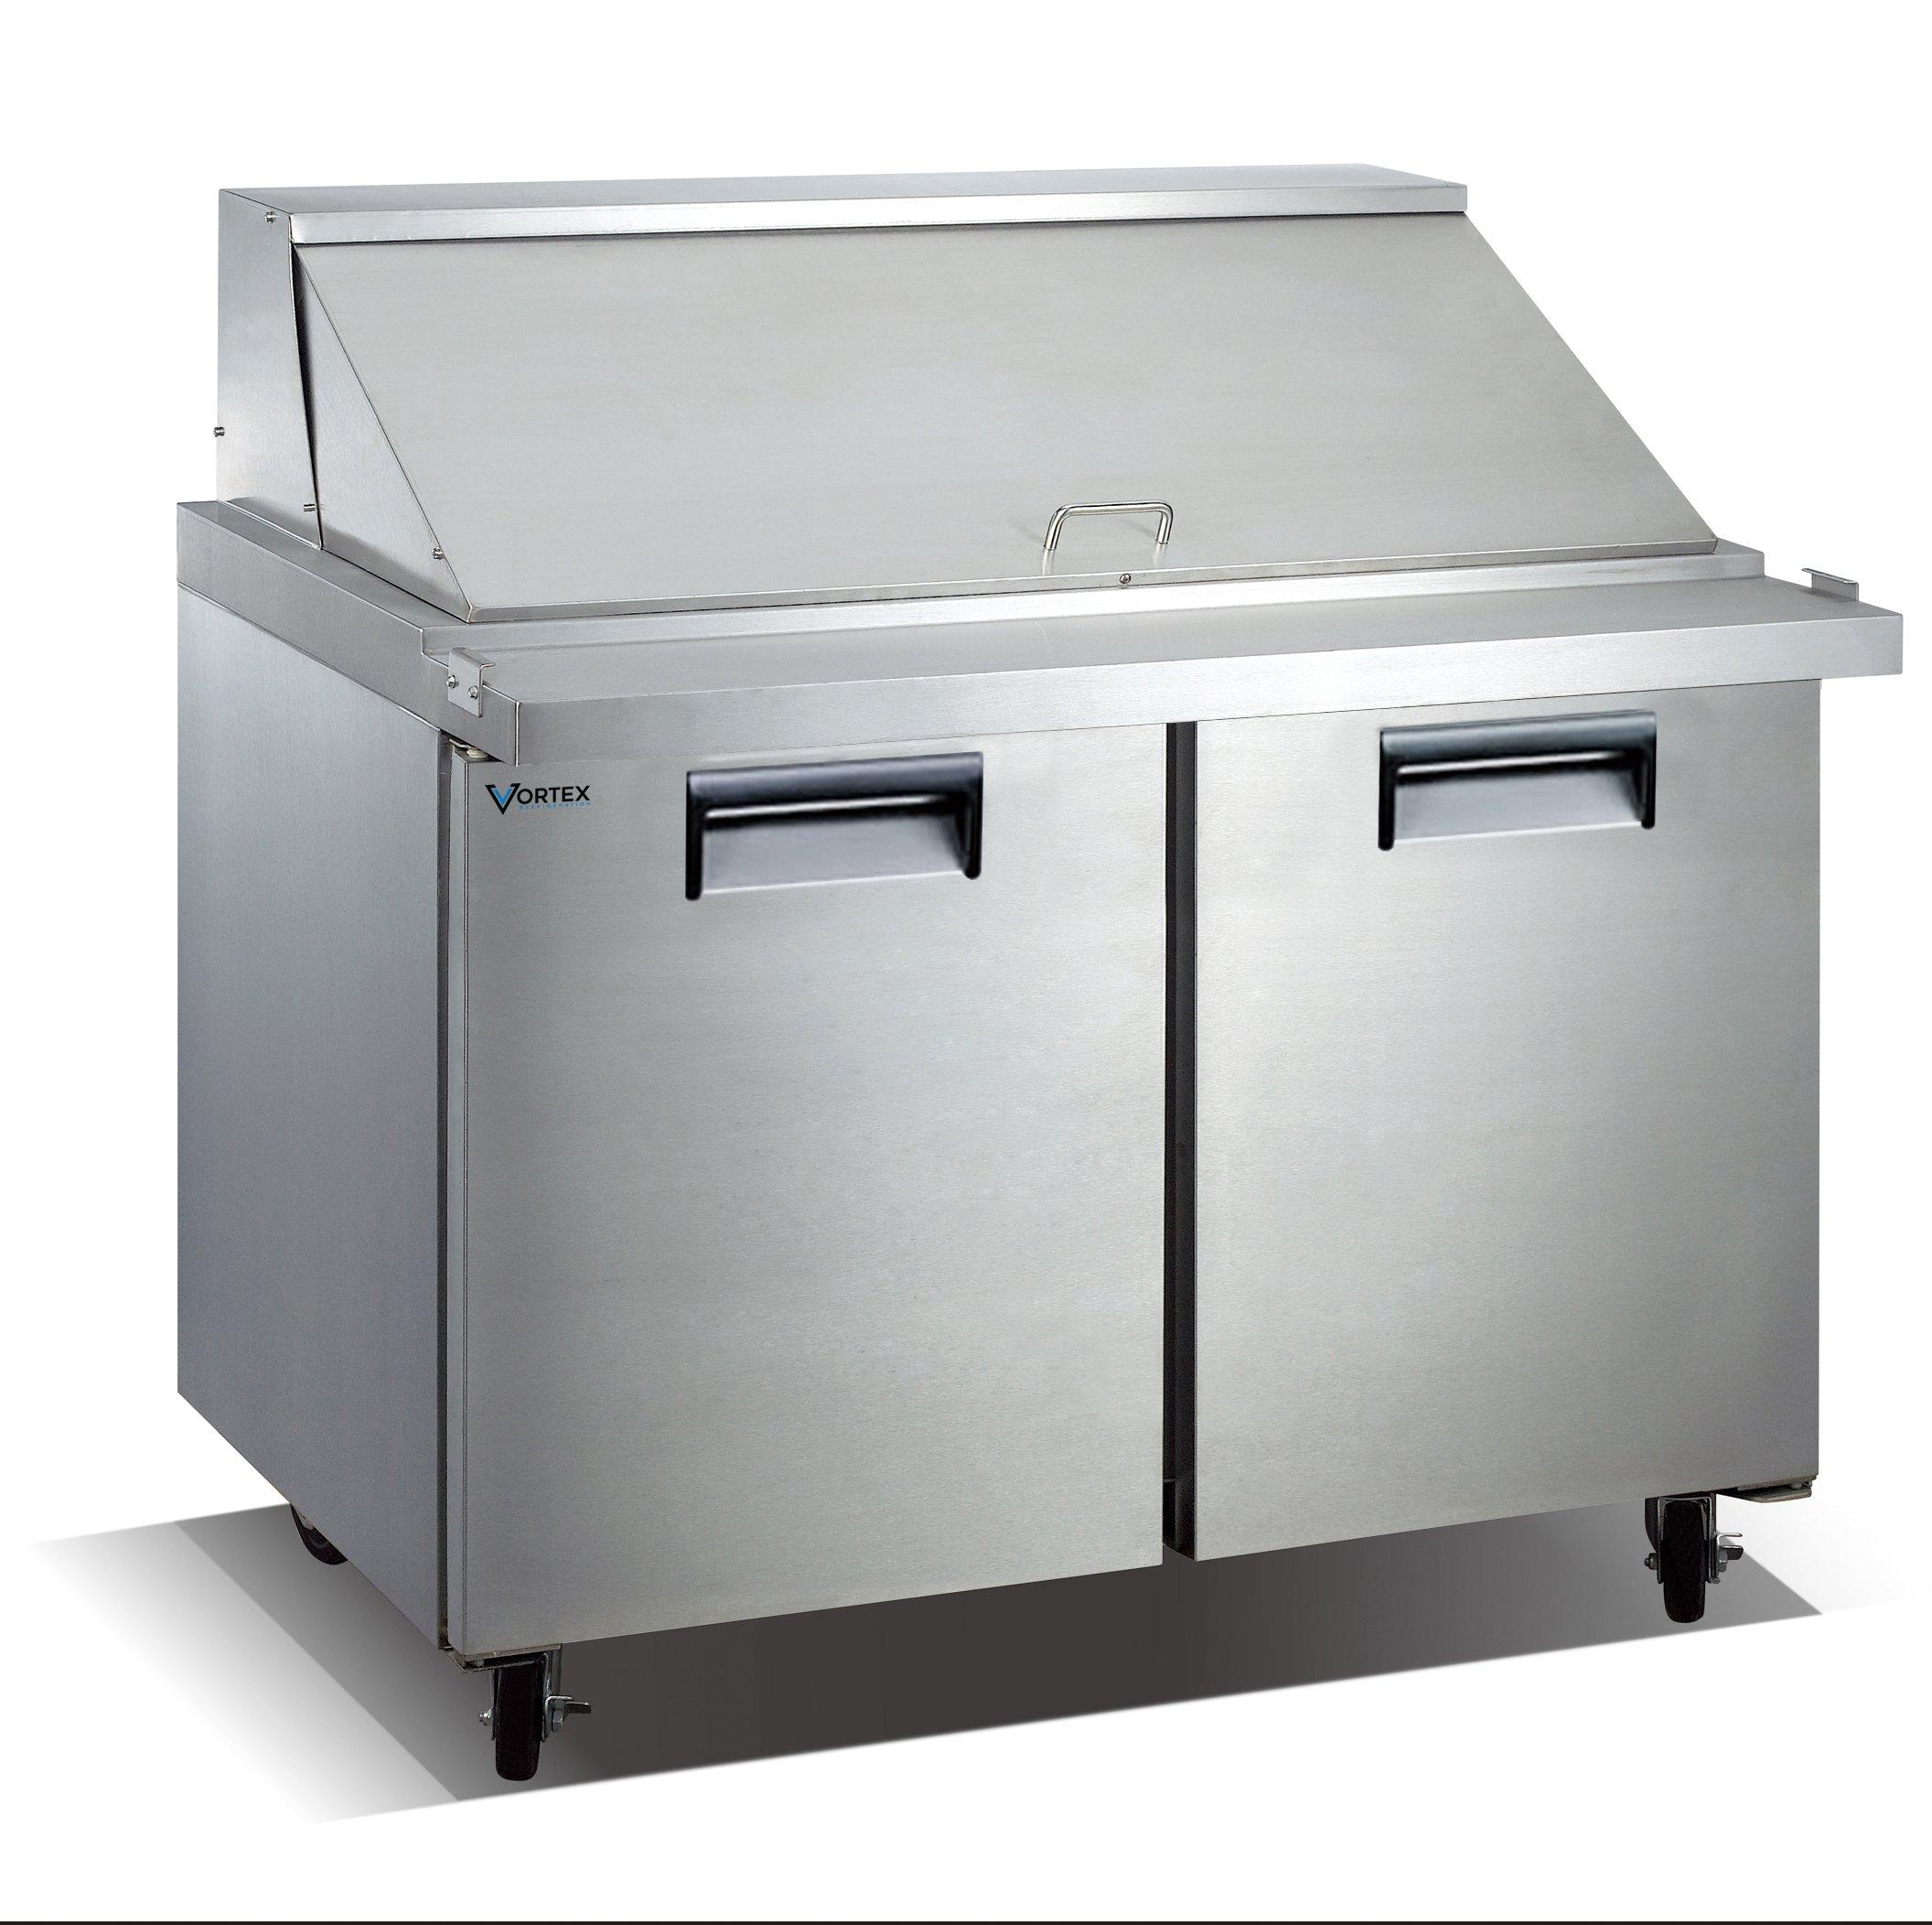 Vortex Refrigeration Commercial 2 Door 48'', 18 Pan Mega Top Sandwich Prep Table - 12.5 Cu. Ft.